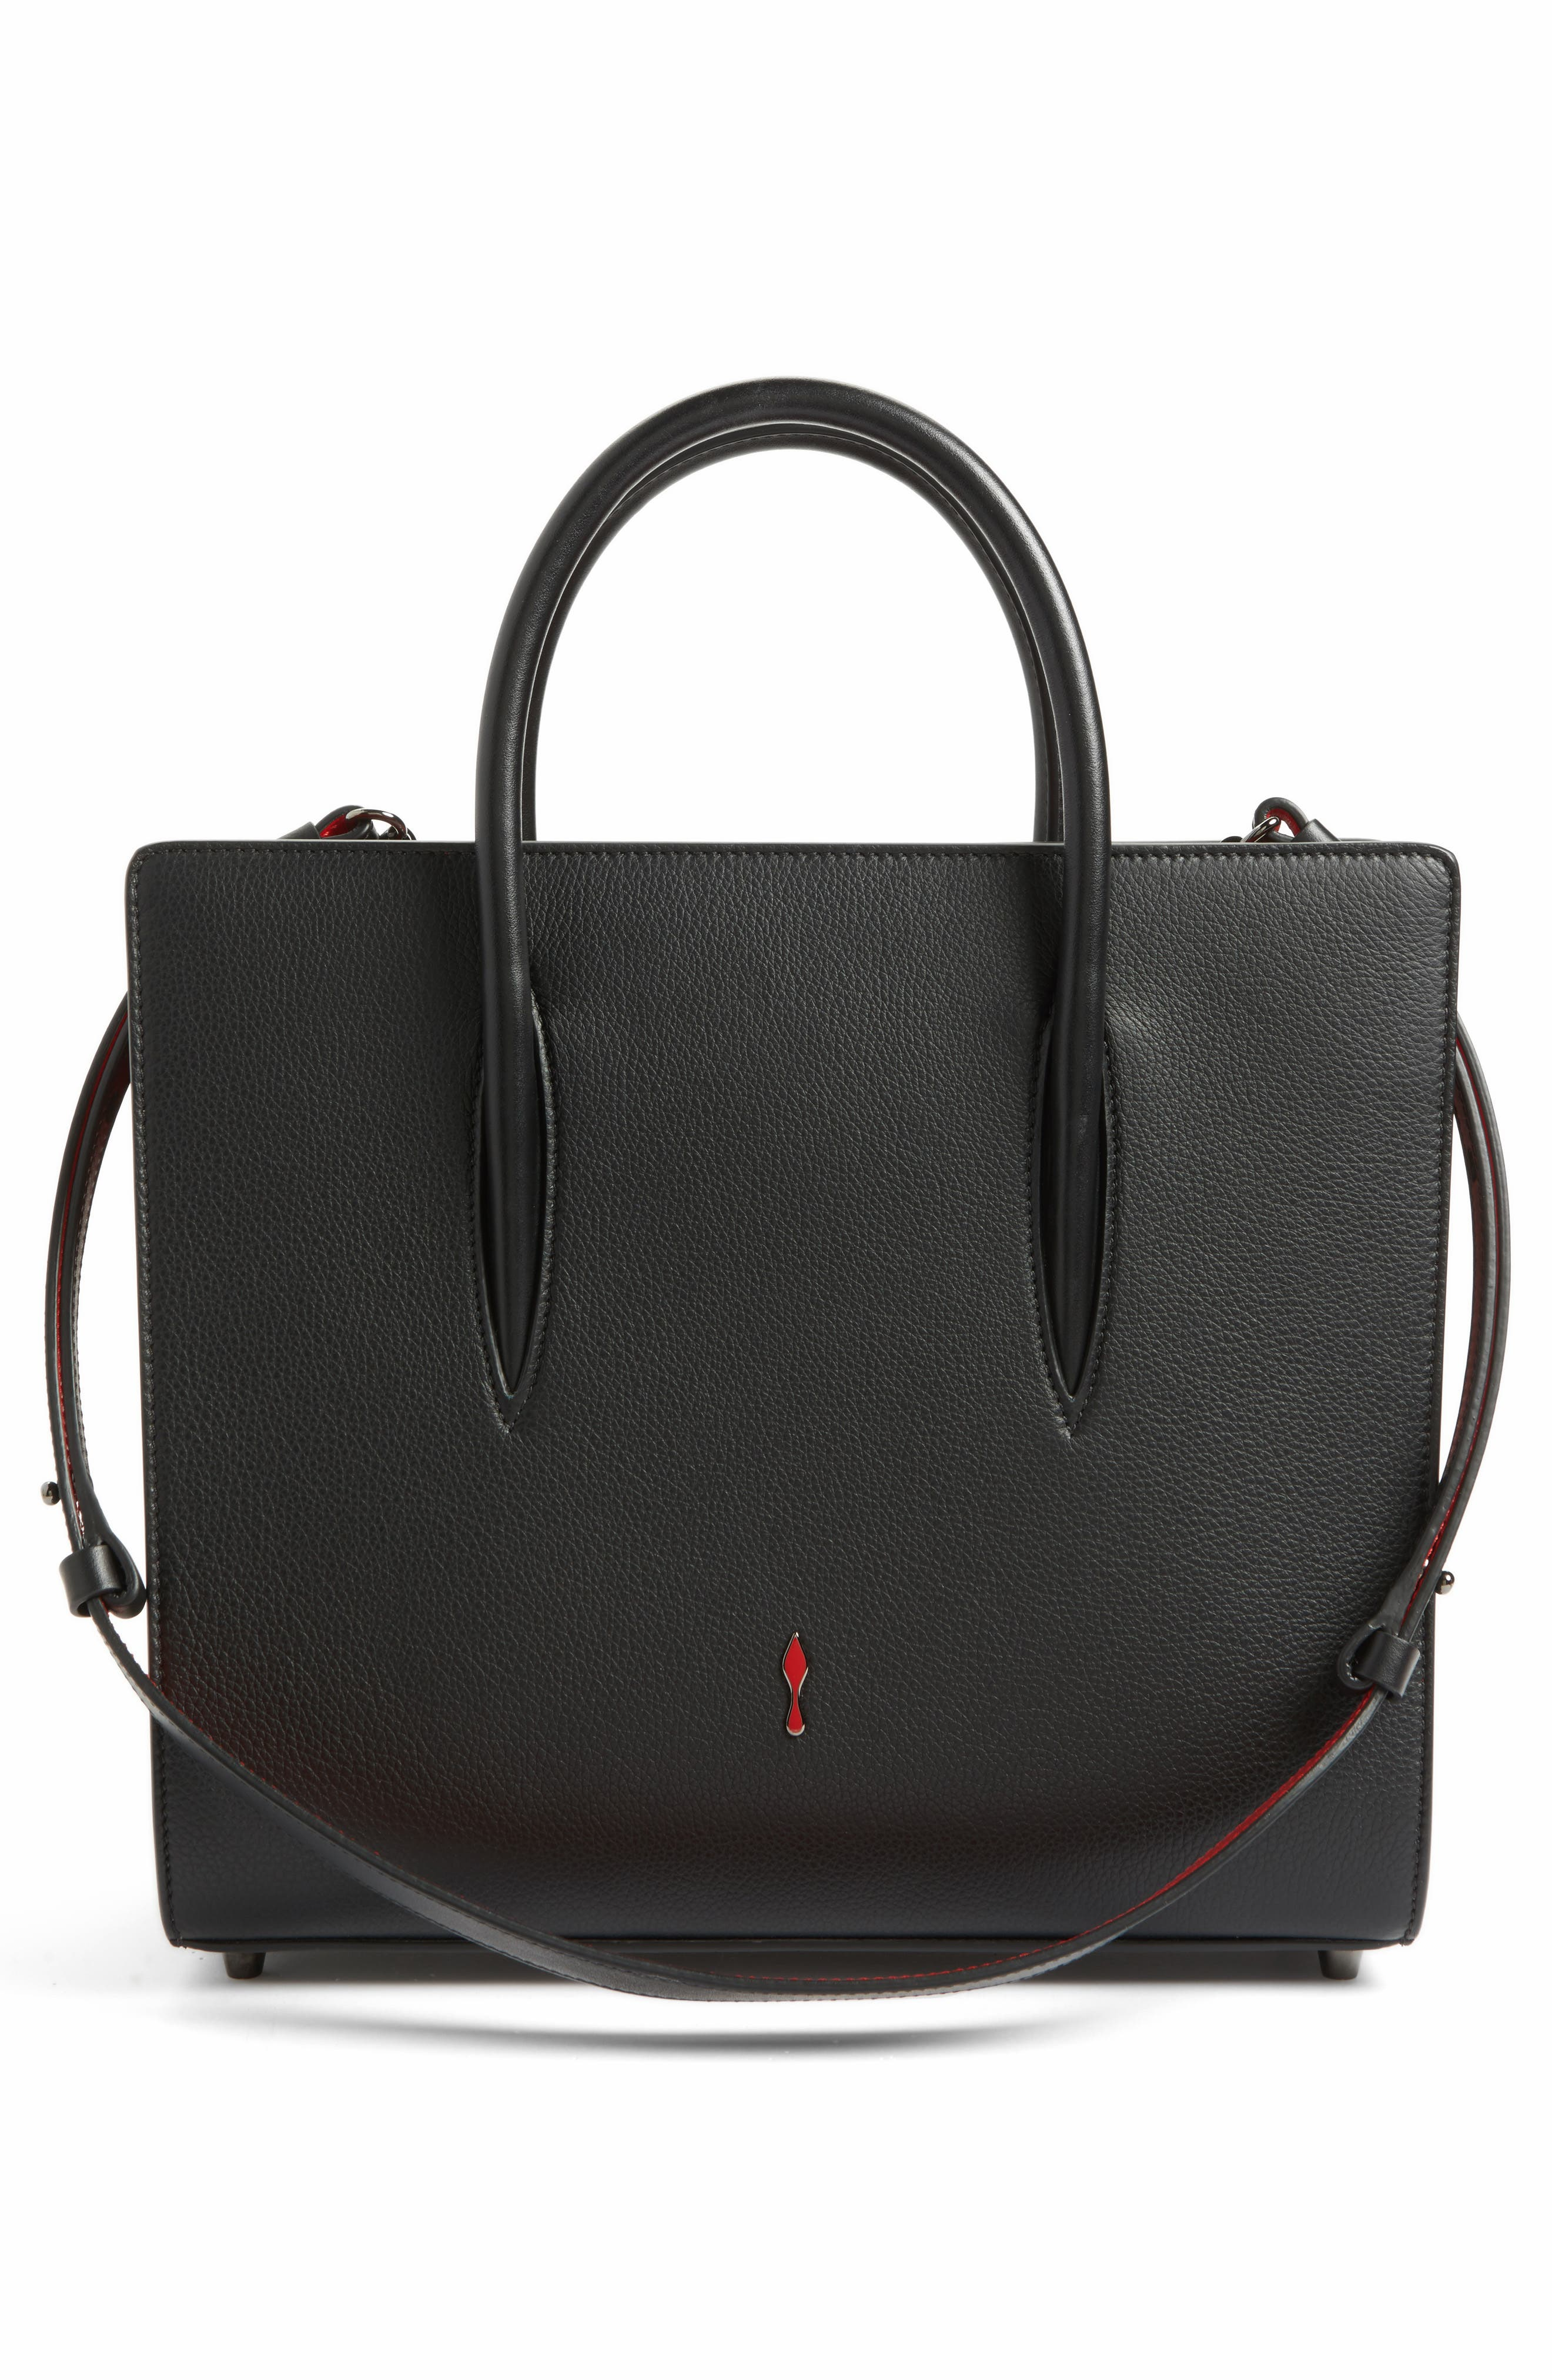 Christian Louboutin Women s Handbags   Purses  50ad42fa05901